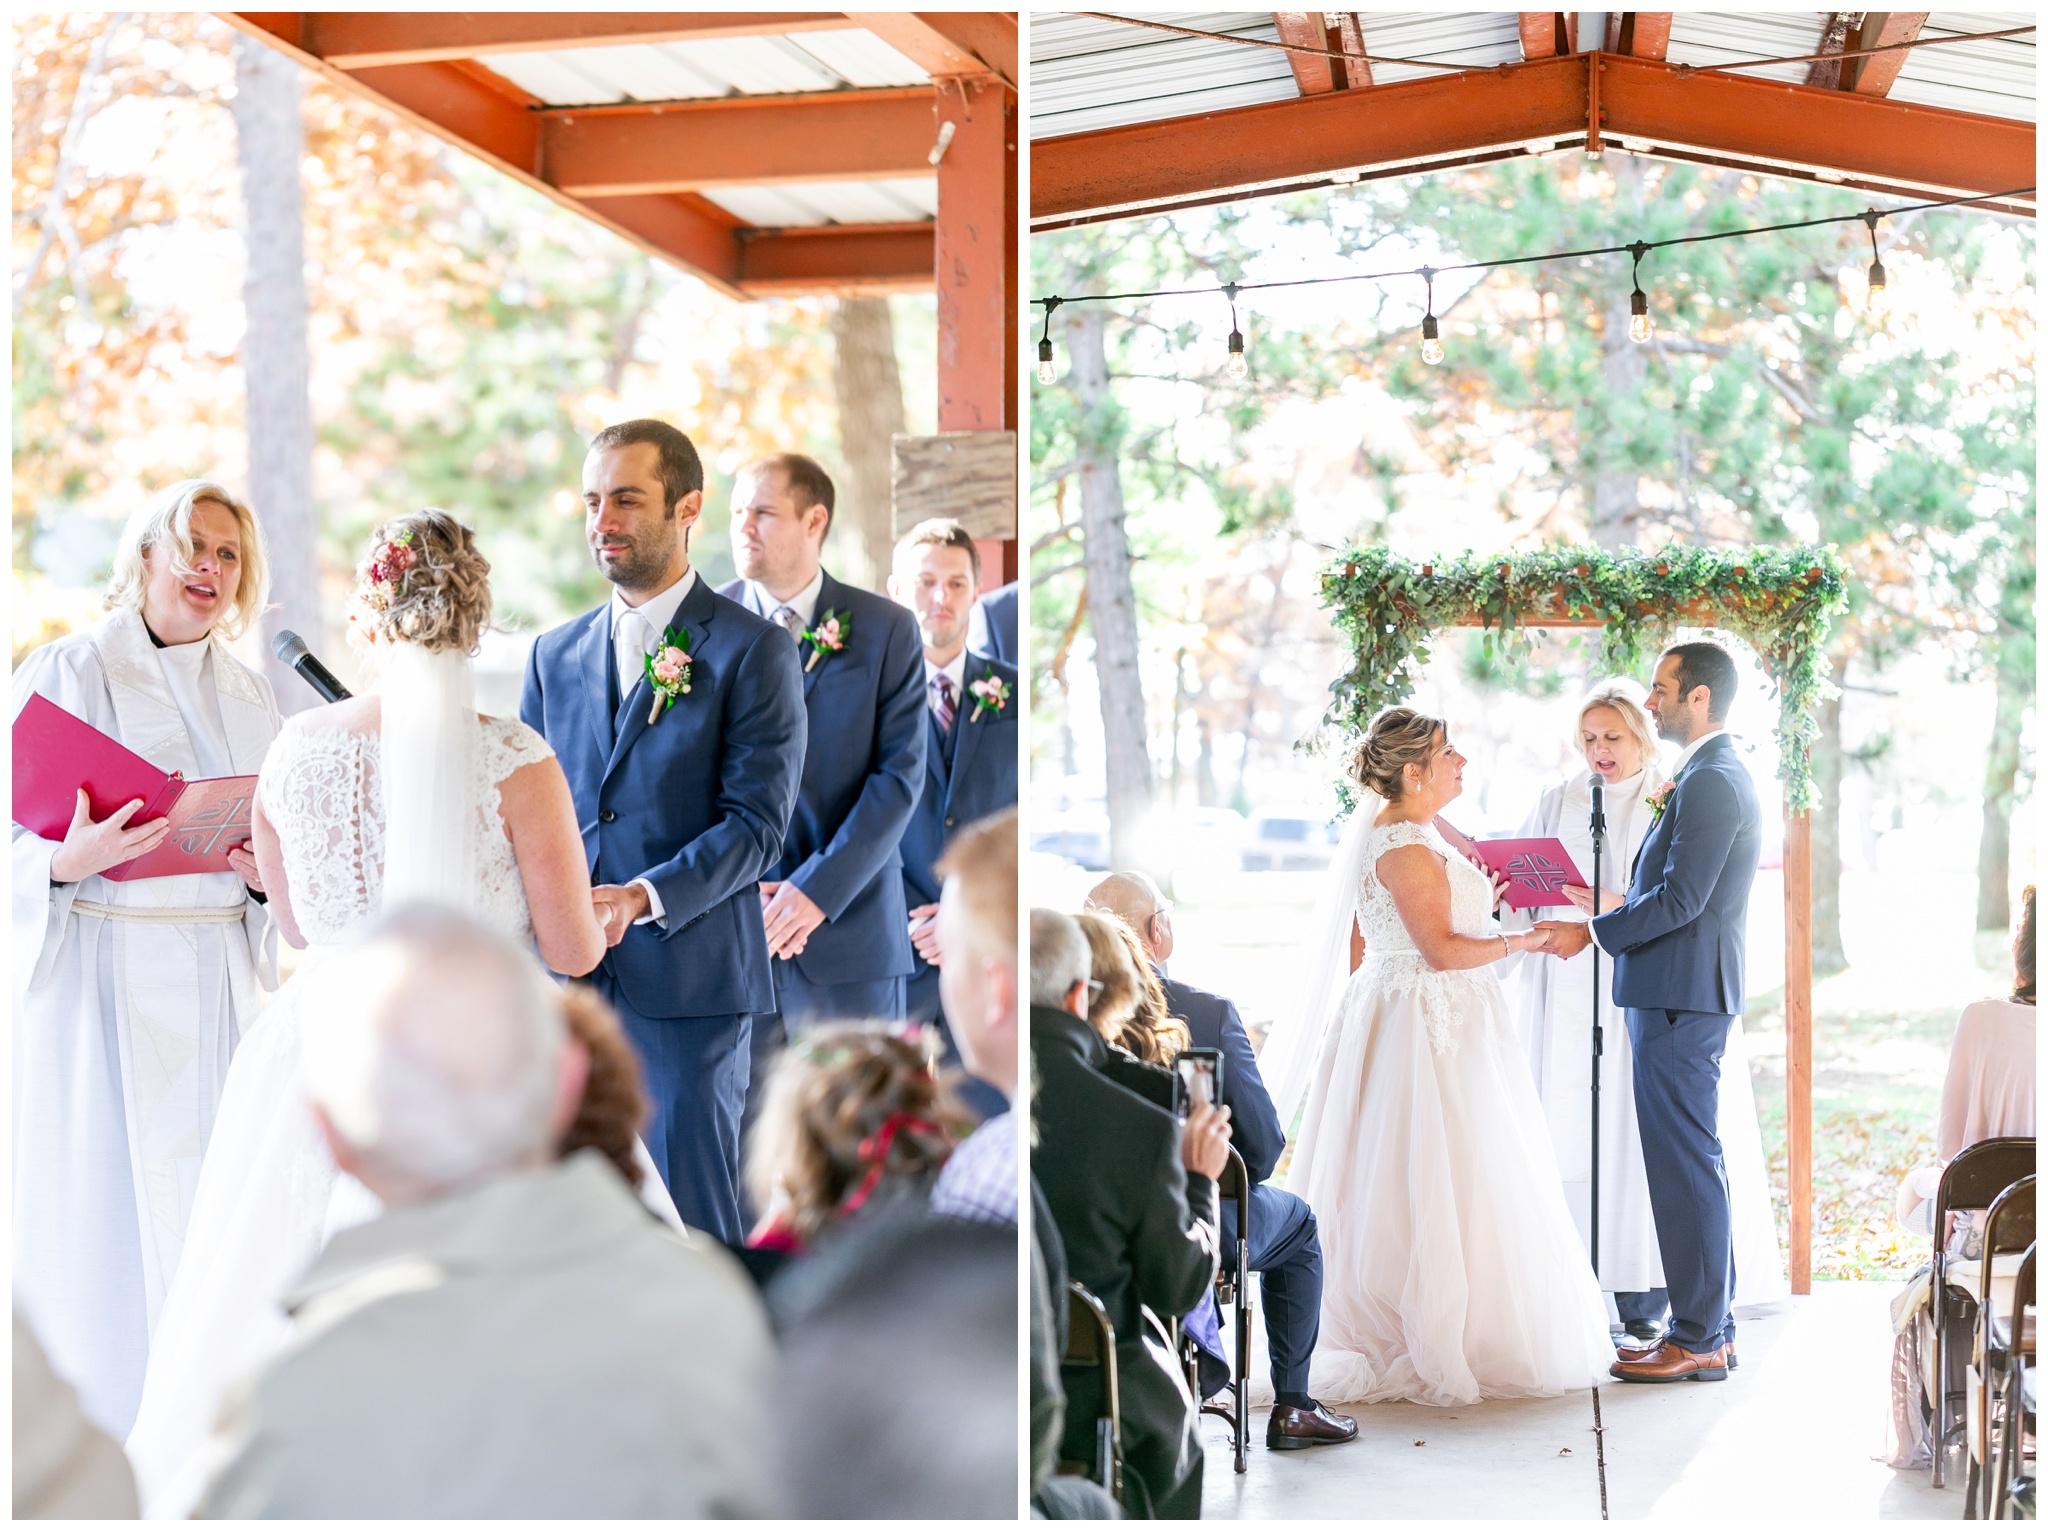 Shawano_County_park_Wedding_Caynay_Photo_Madison_Wi_2288.jpg